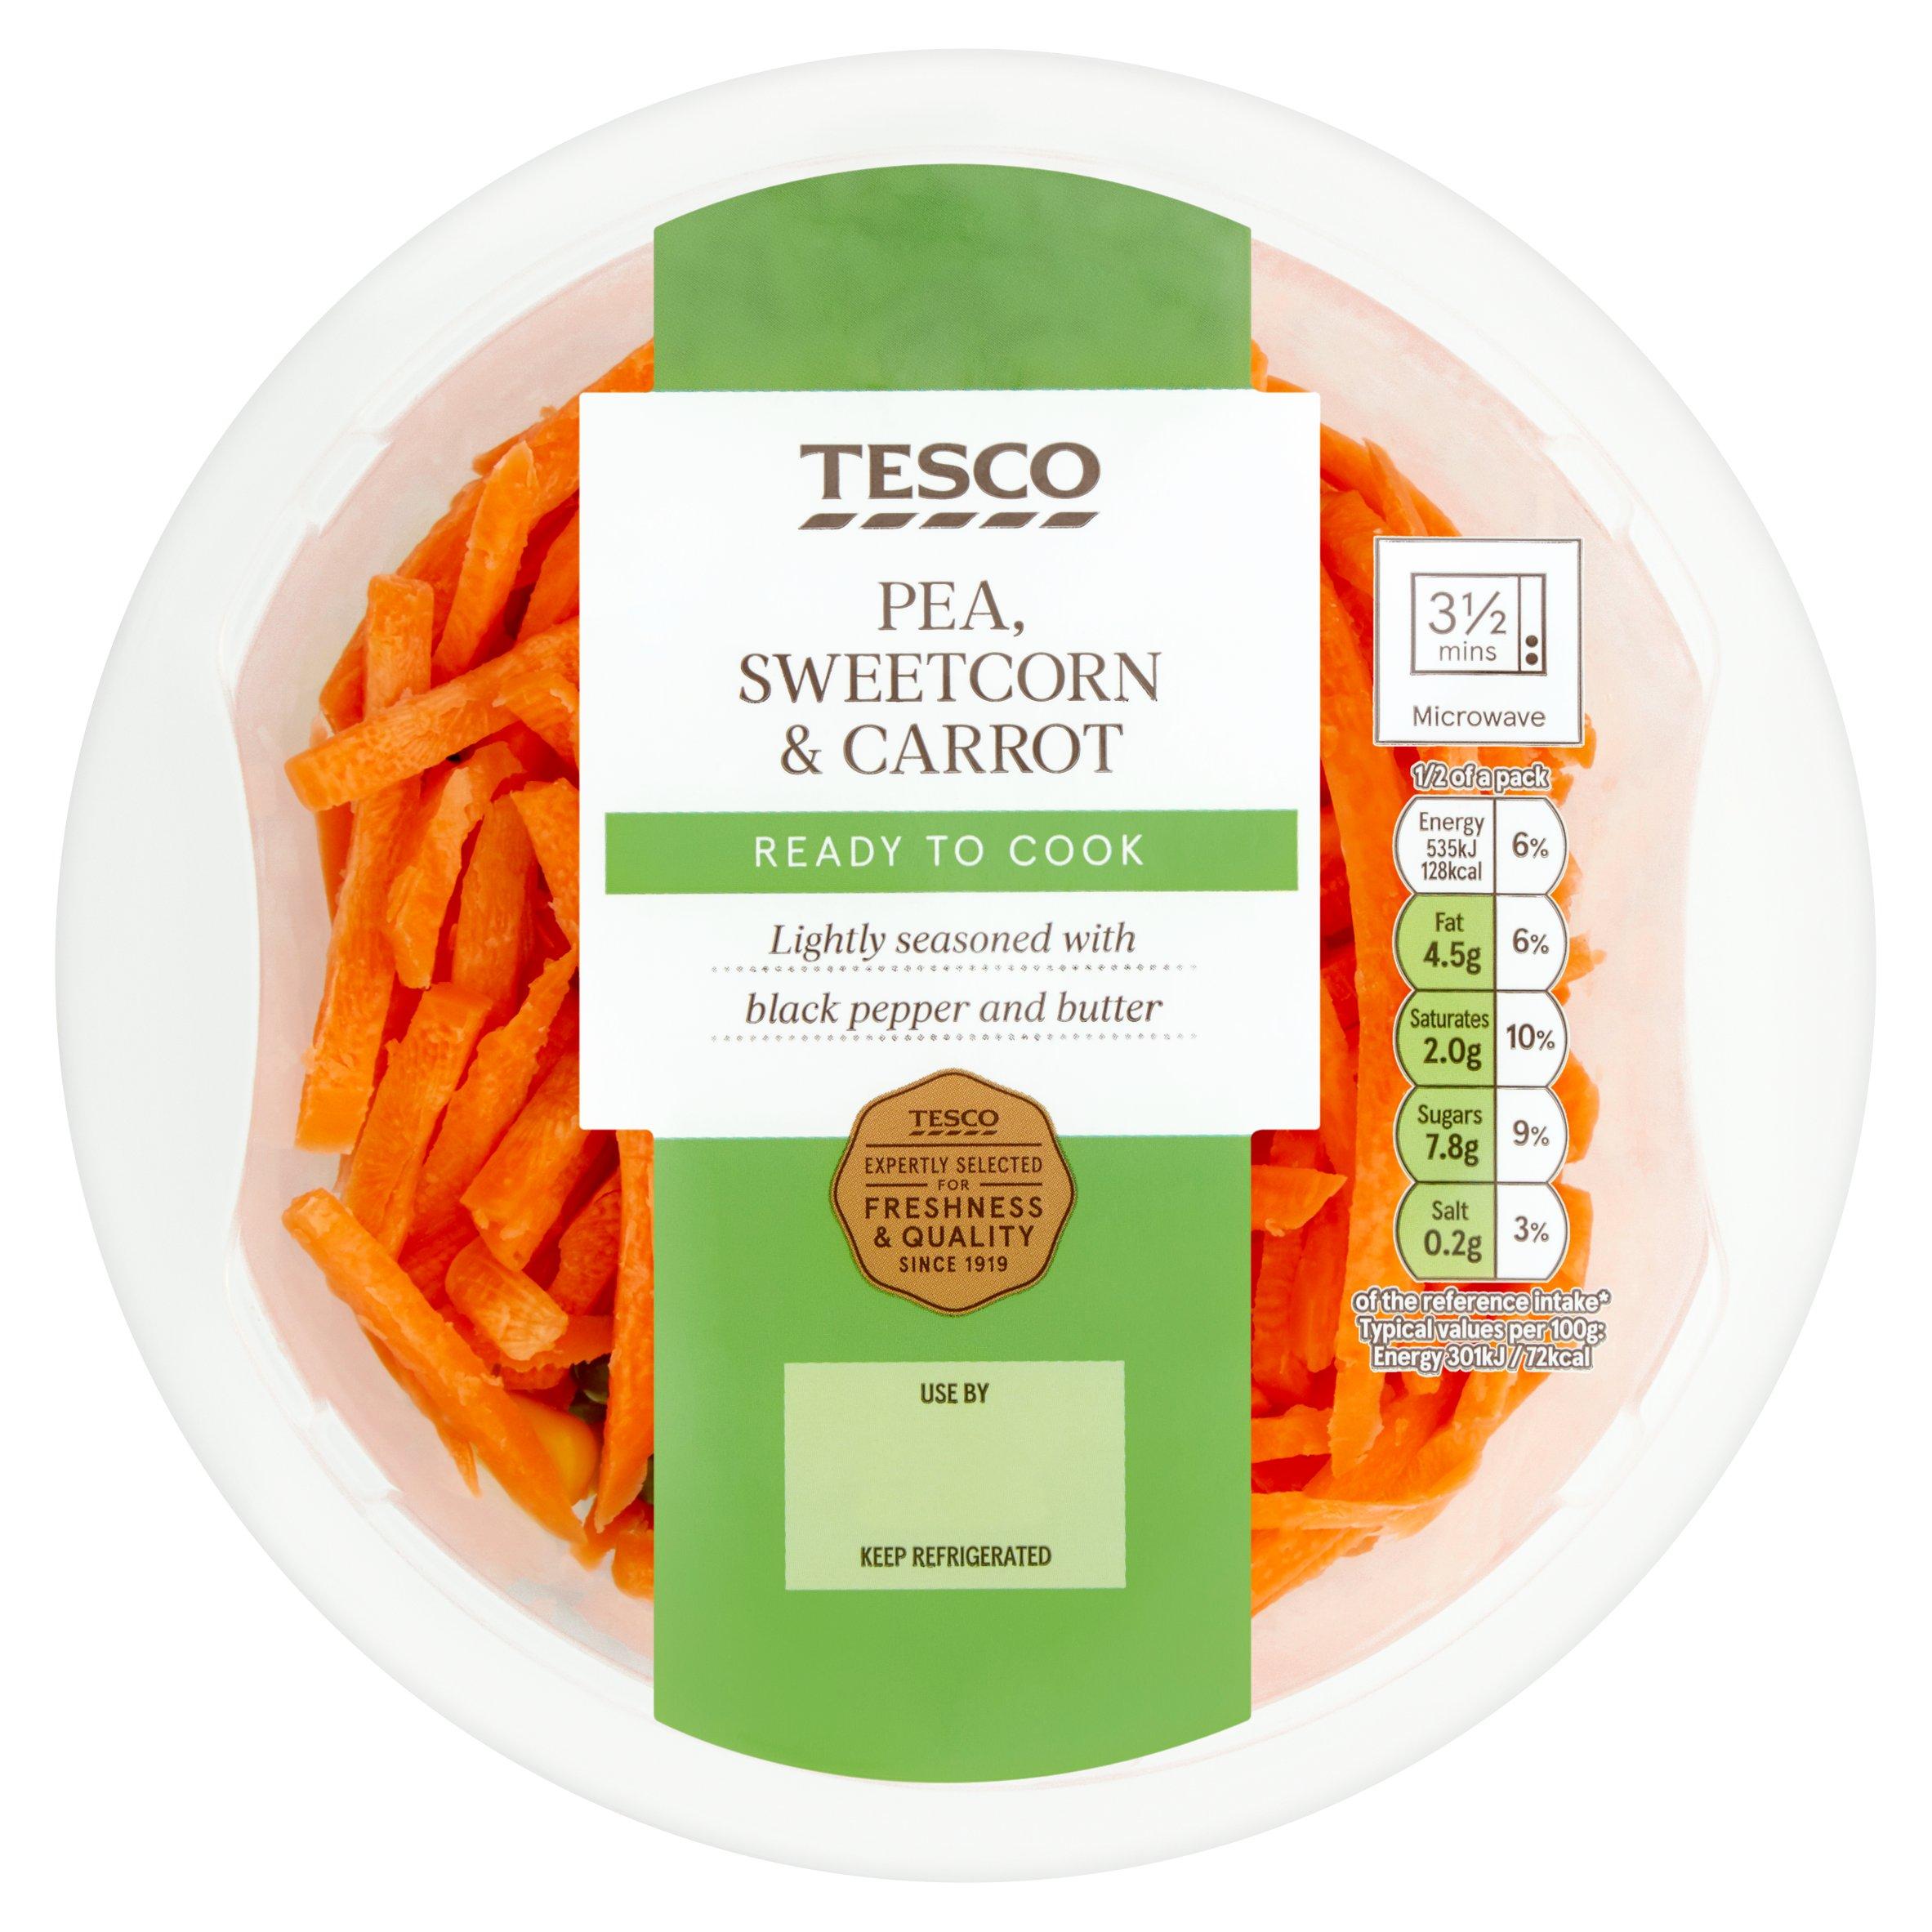 Tesco Carrot Sweetcorn & Peas Layered Vegetable 355G